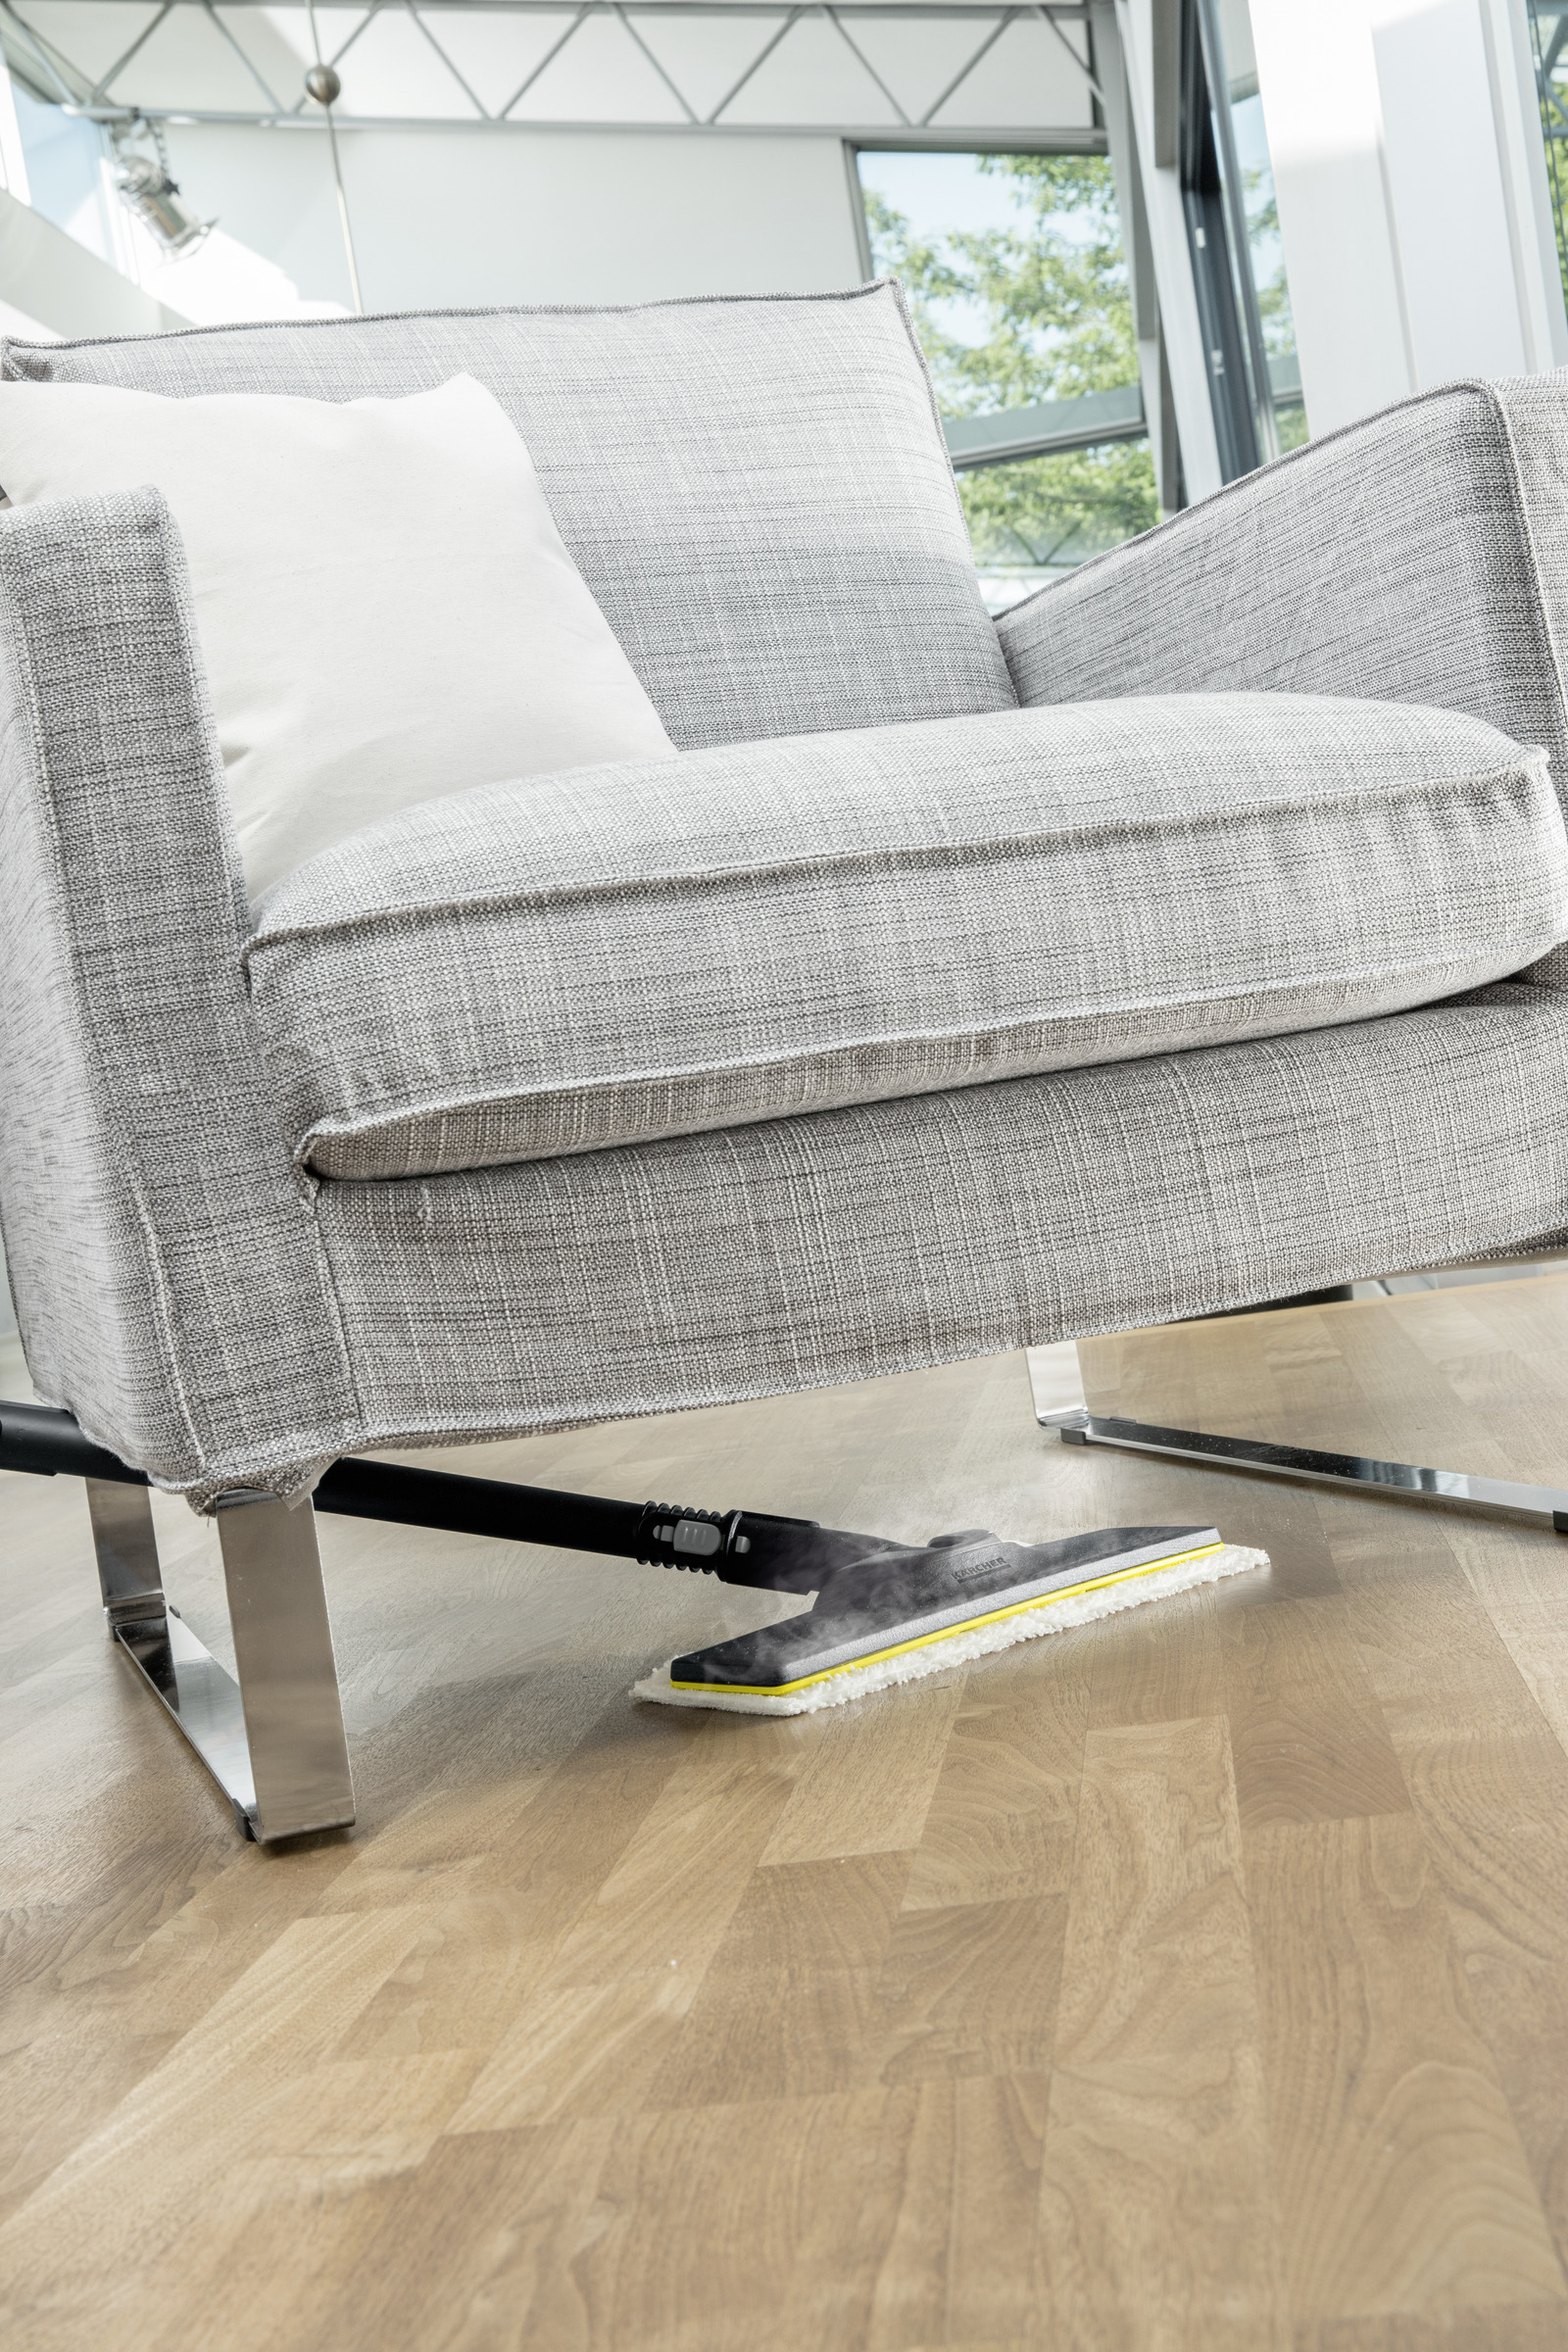 ngtv tt sc 3 easyfix premium vit k rcher. Black Bedroom Furniture Sets. Home Design Ideas